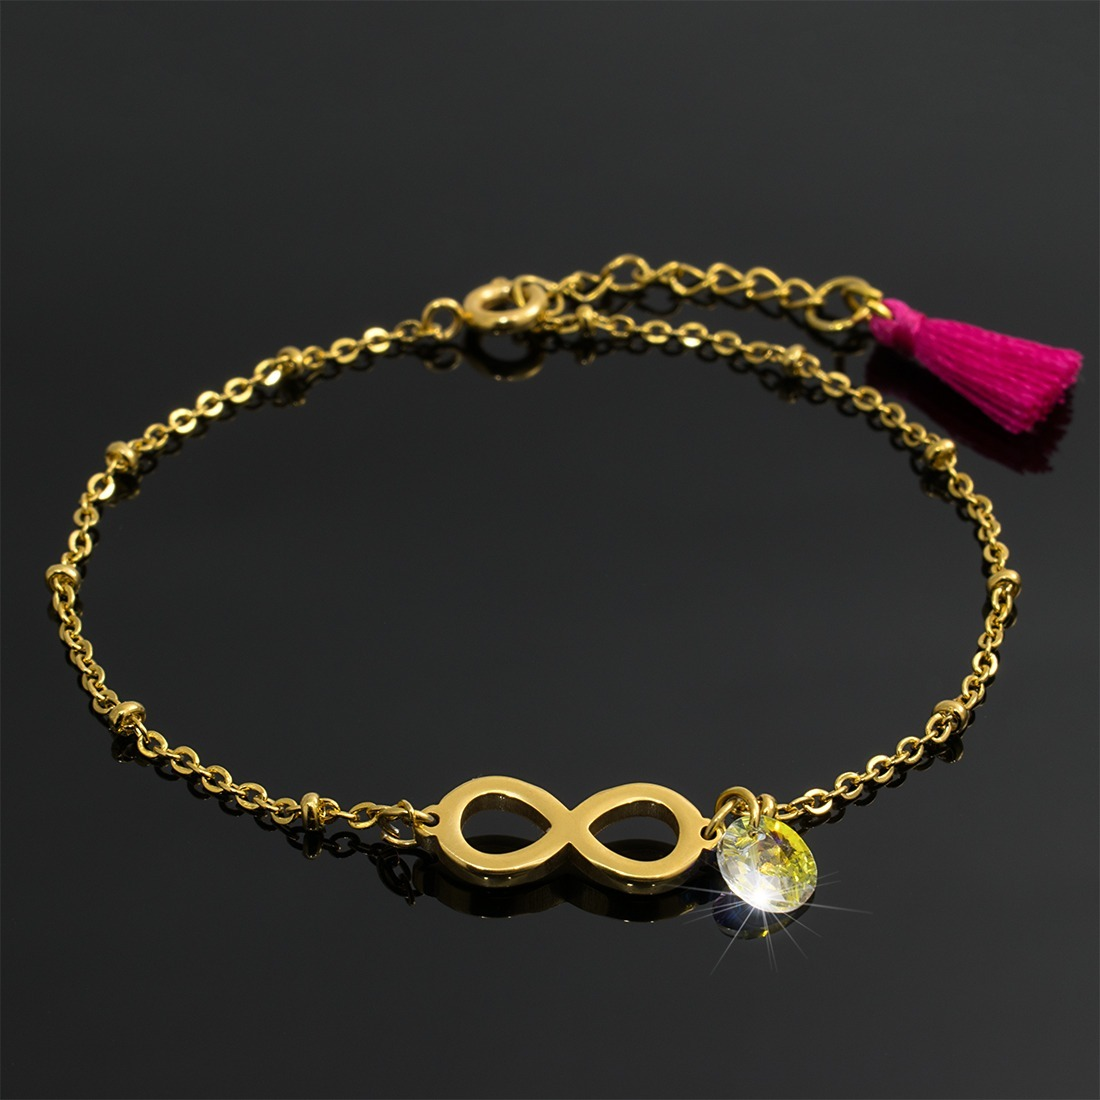 35779a57c45a pulsera mujer acero dorado con infinito dije swarovski borla. Cargando zoom.